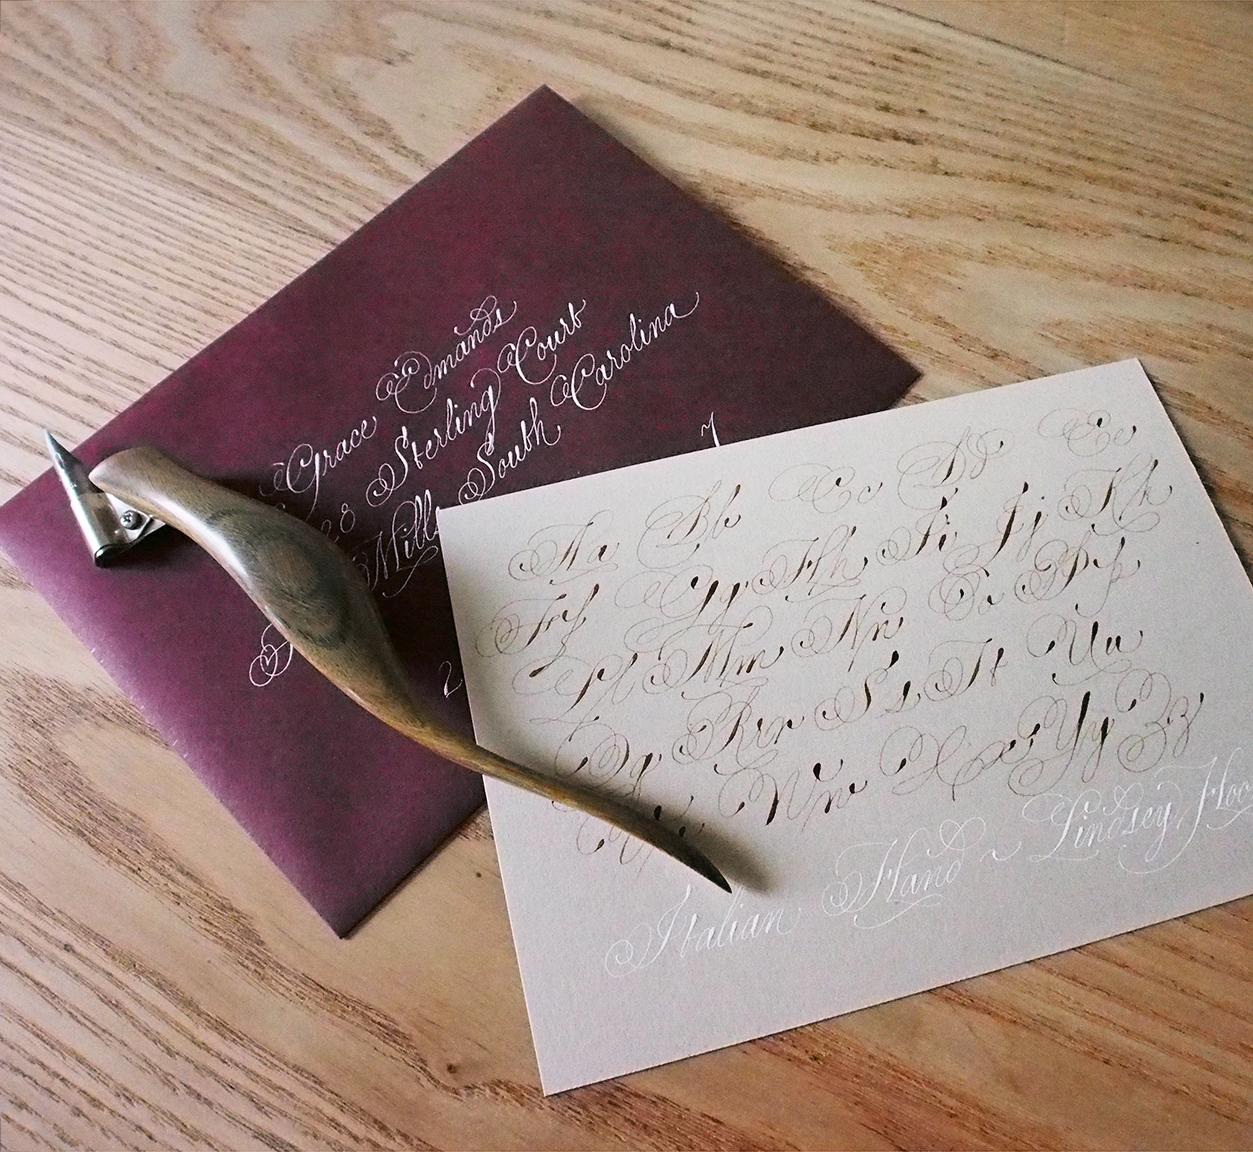 Italian Hand - Bordeaux Envelope and Cement Exemplar Set